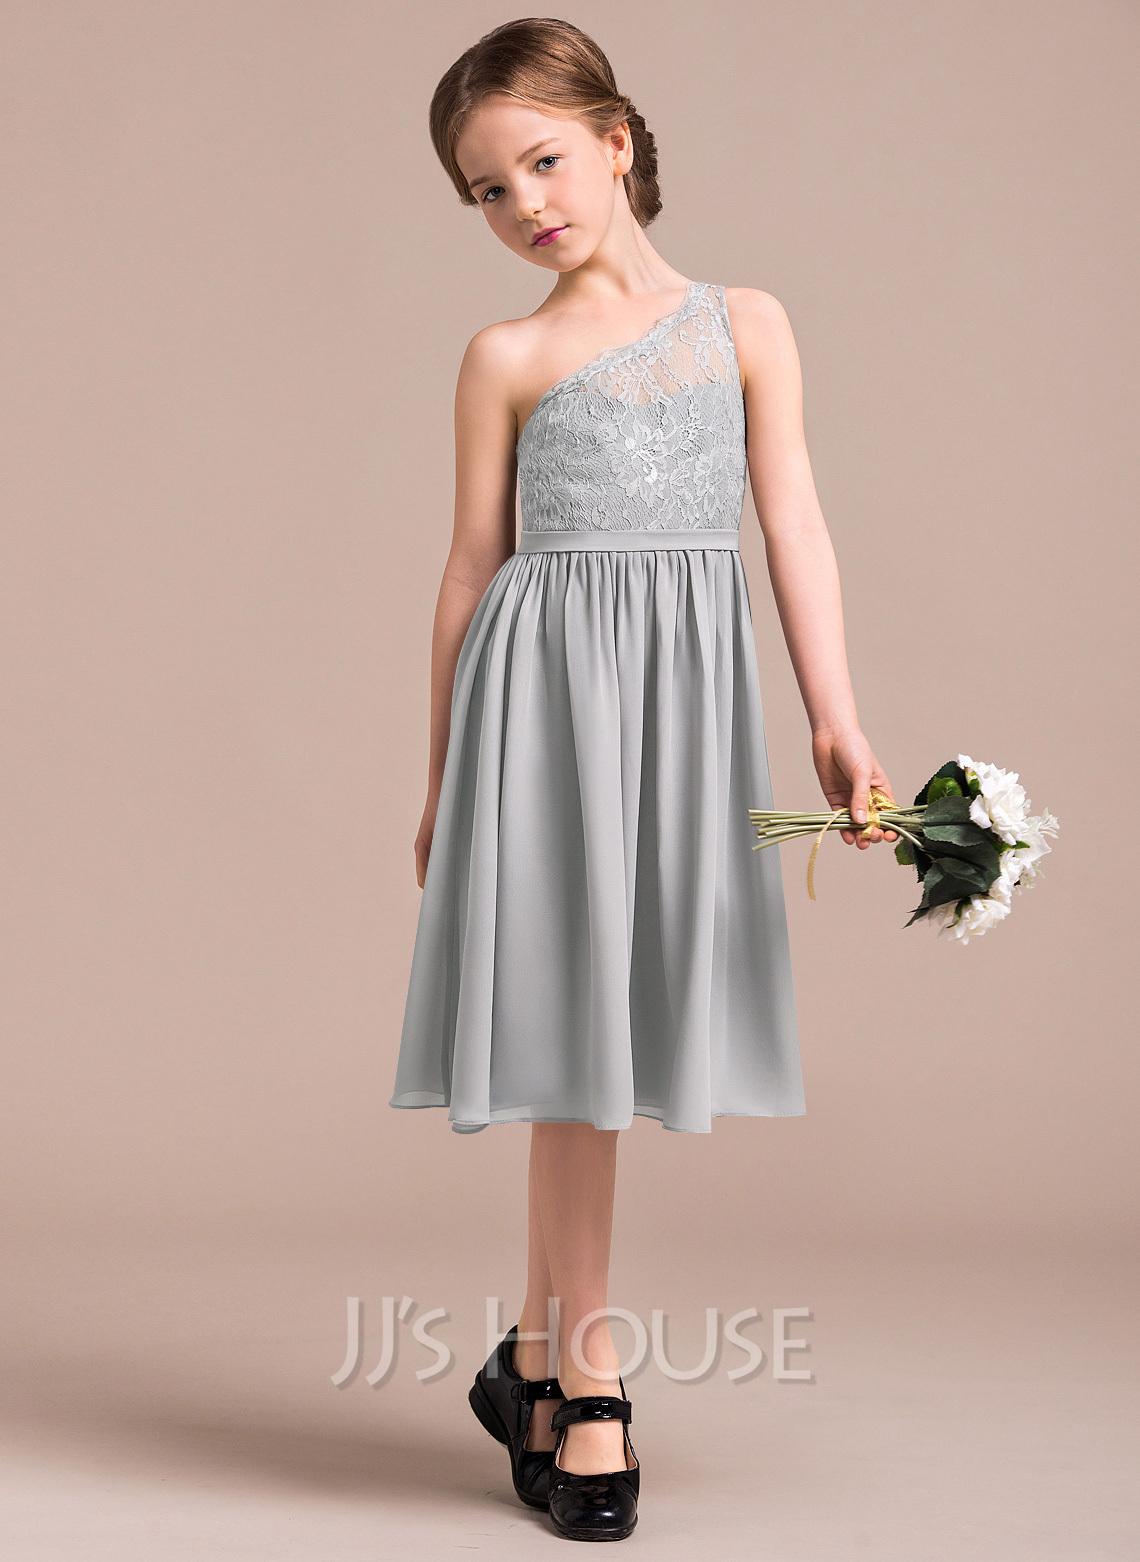 A-Line One-Shoulder Knee-Length Chiffon Lace Junior Bridesmaid Dress